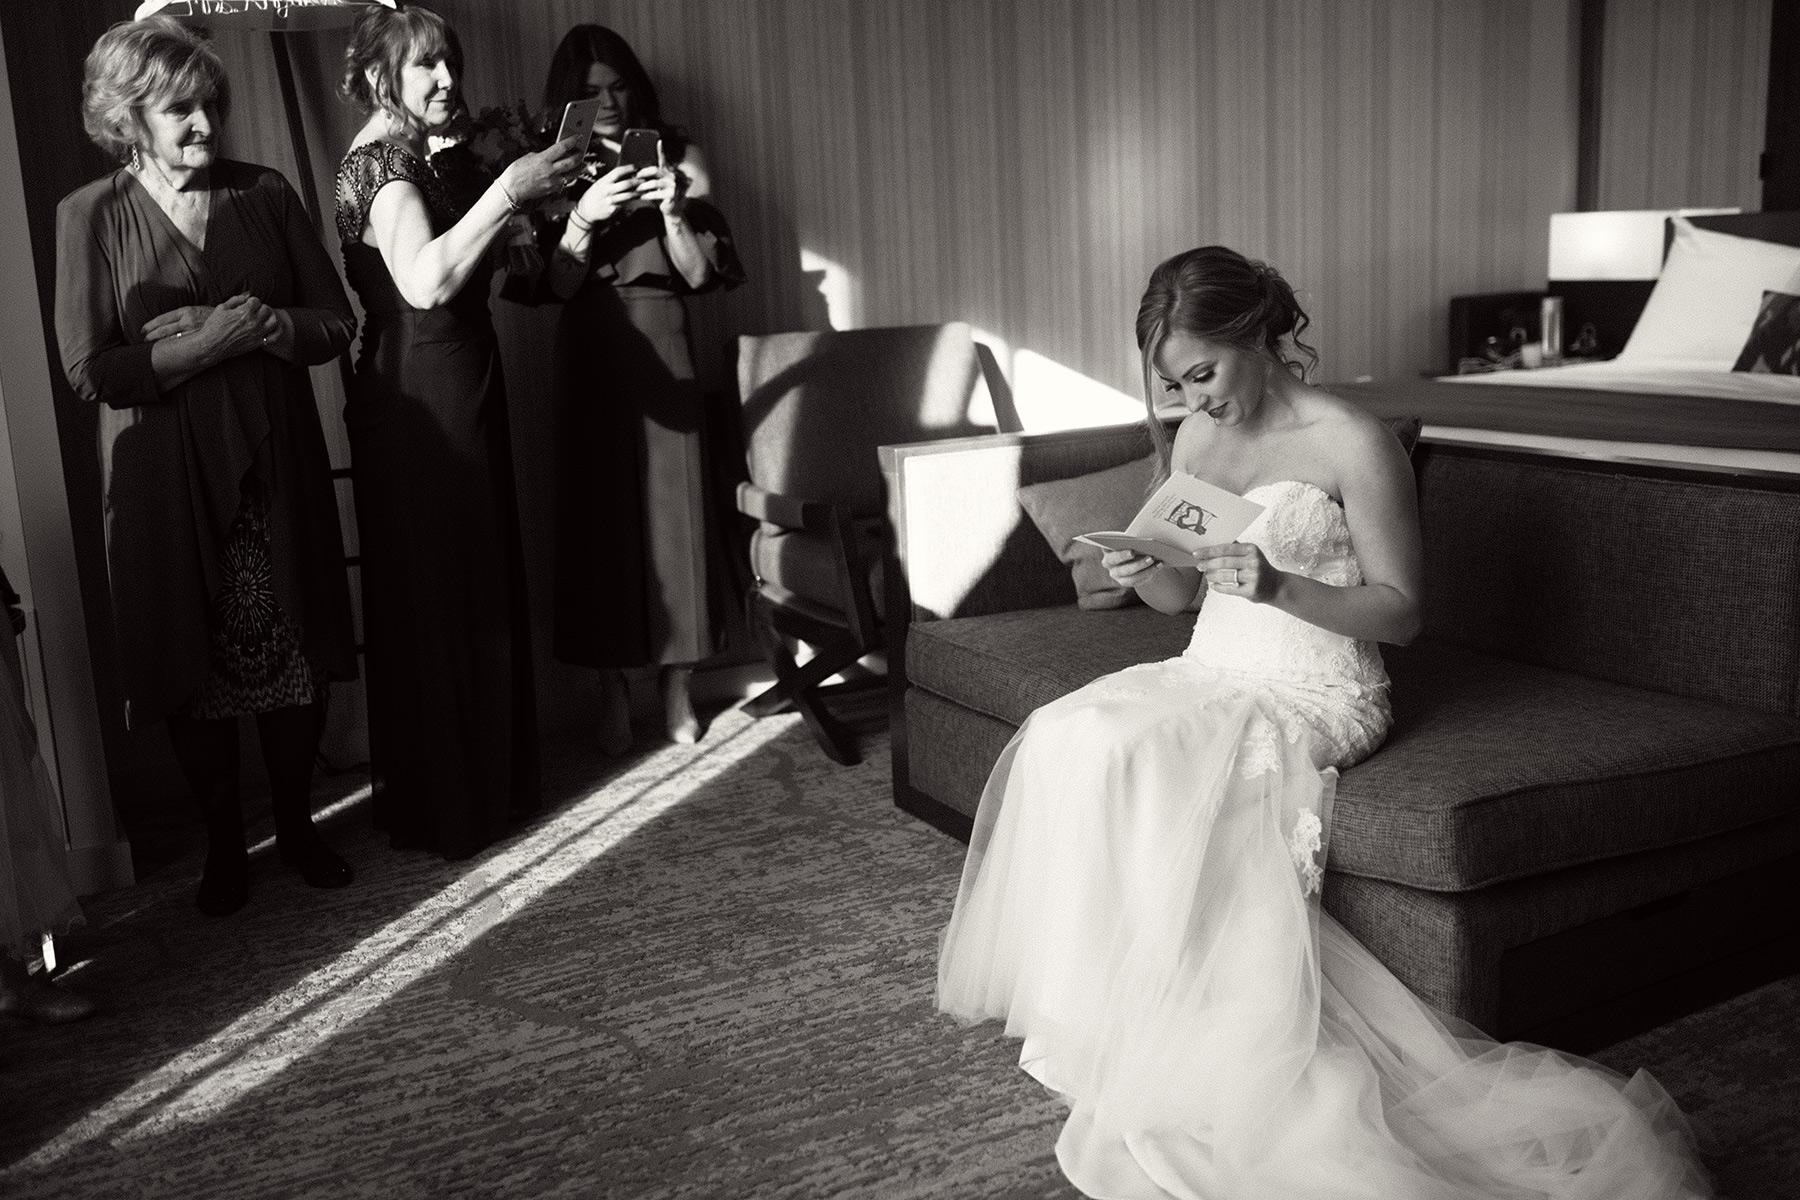 The-Lodge-Edgewood-Tahoe-wedding-getting-ready